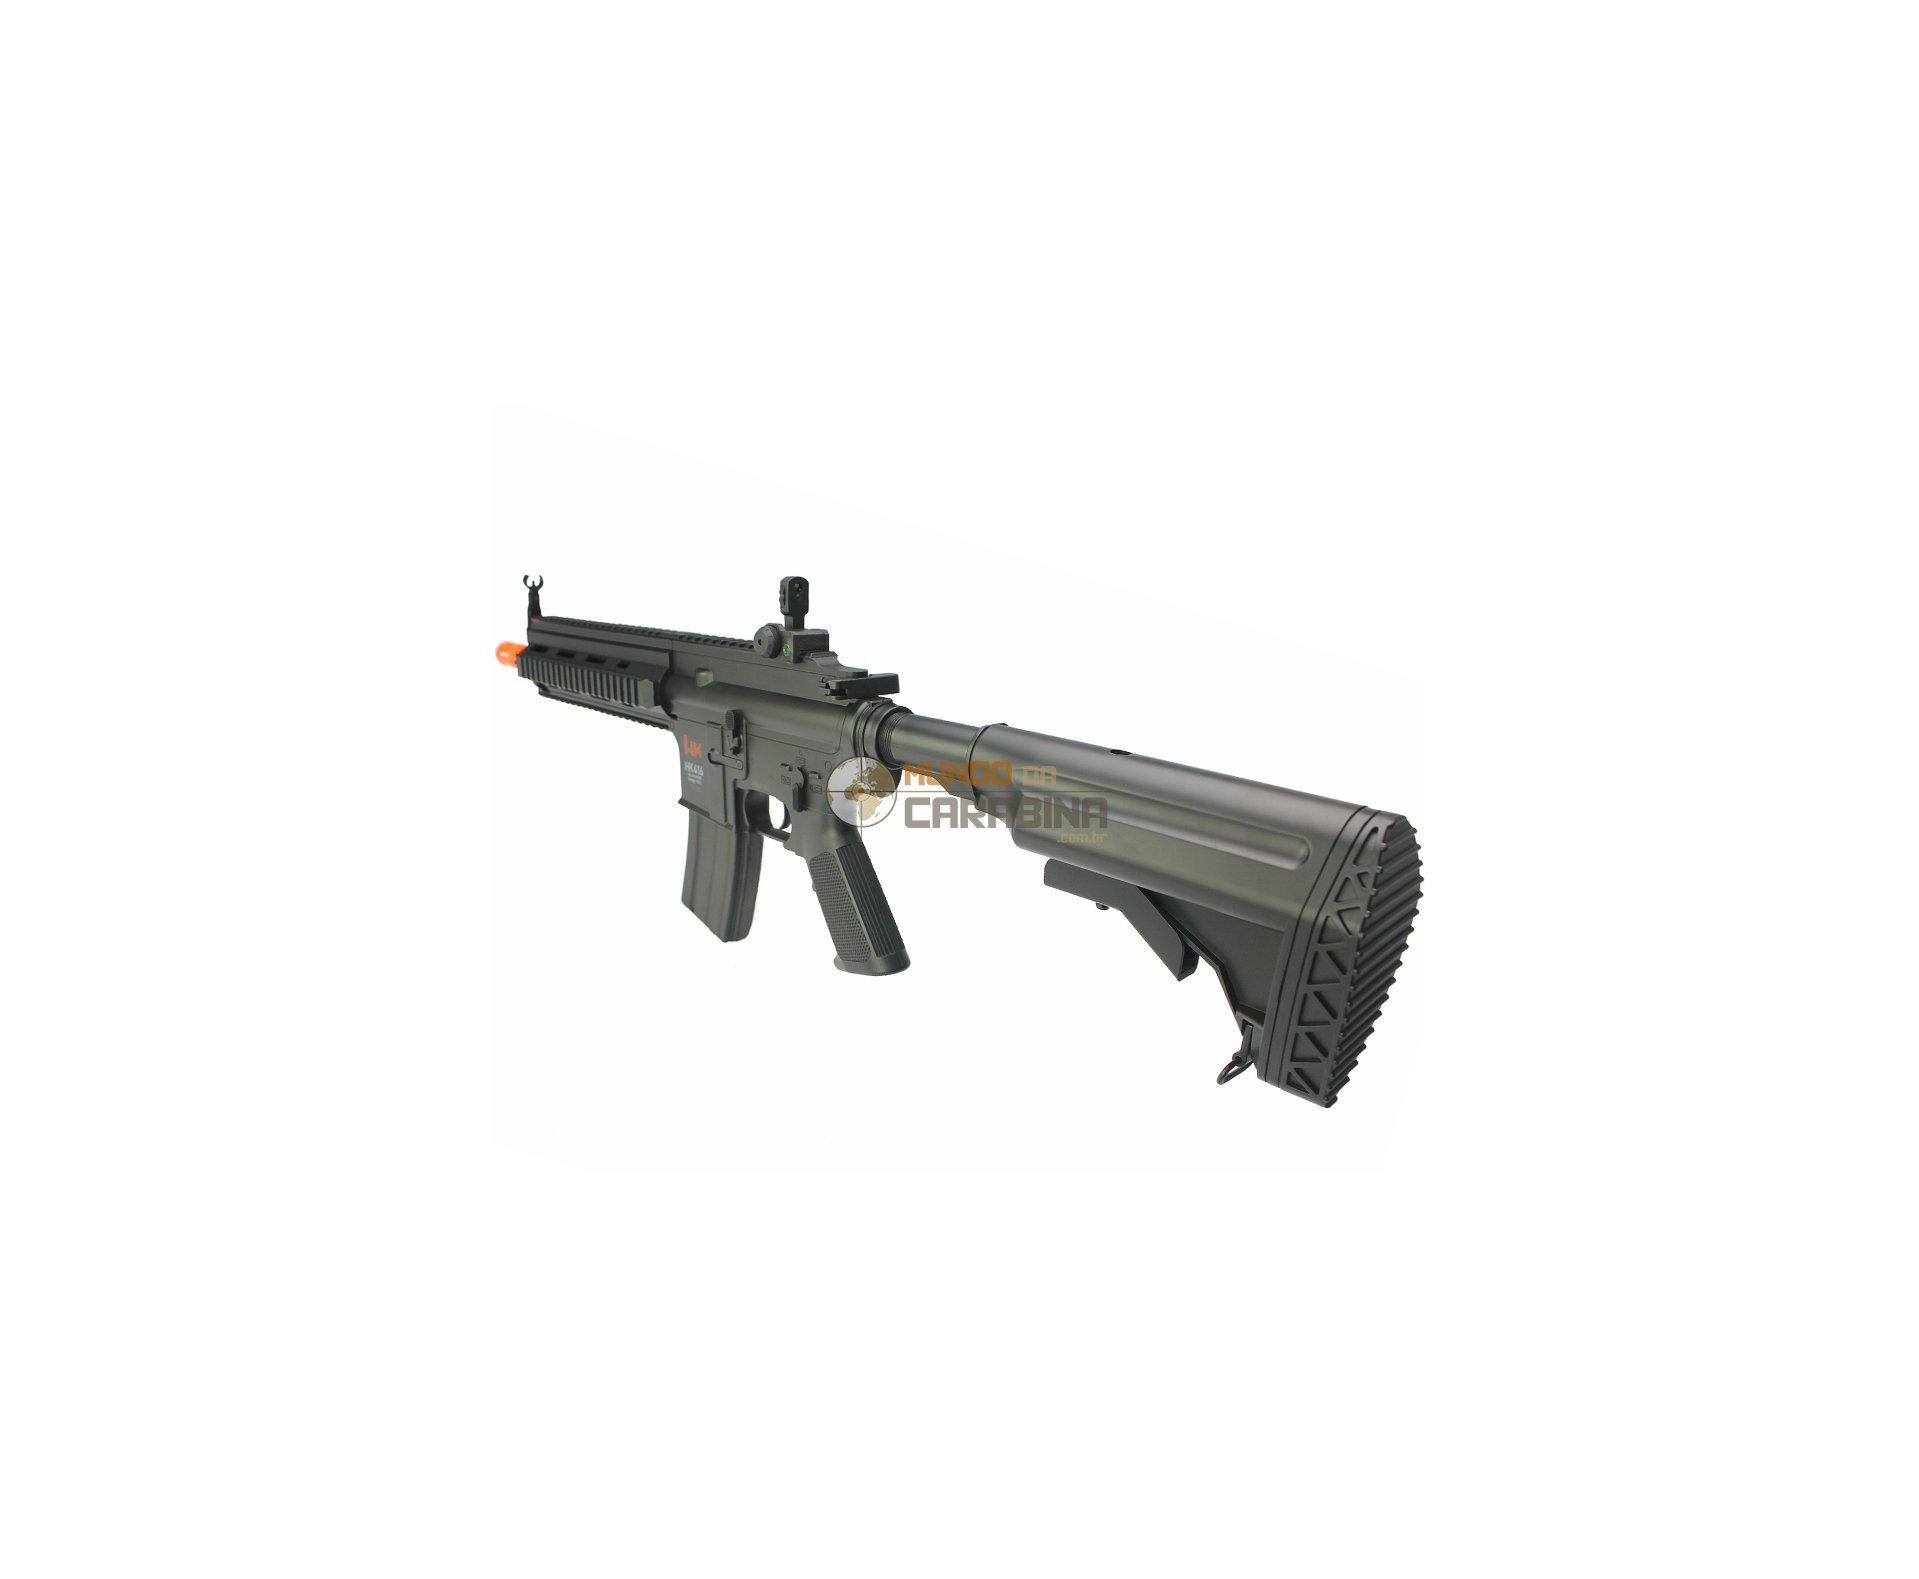 Rifle De Airsoft H&k Hk 416 Cqb Bivolt - Cal 6.0mm - Umarex